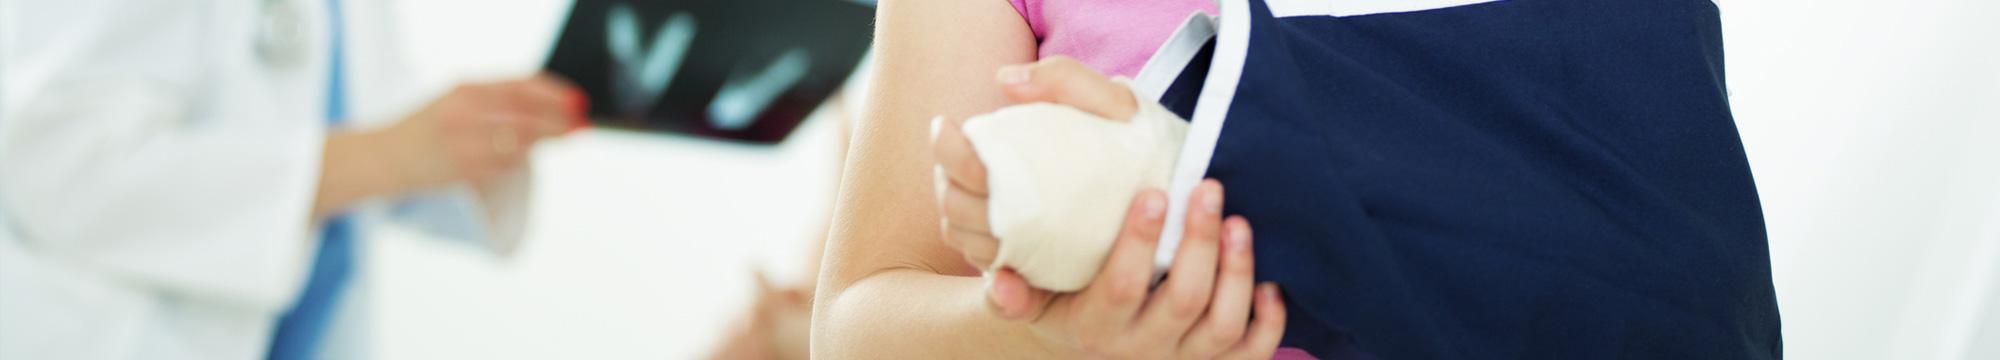 Pediatric Orthopedic - OrthoOne Sports Medicine